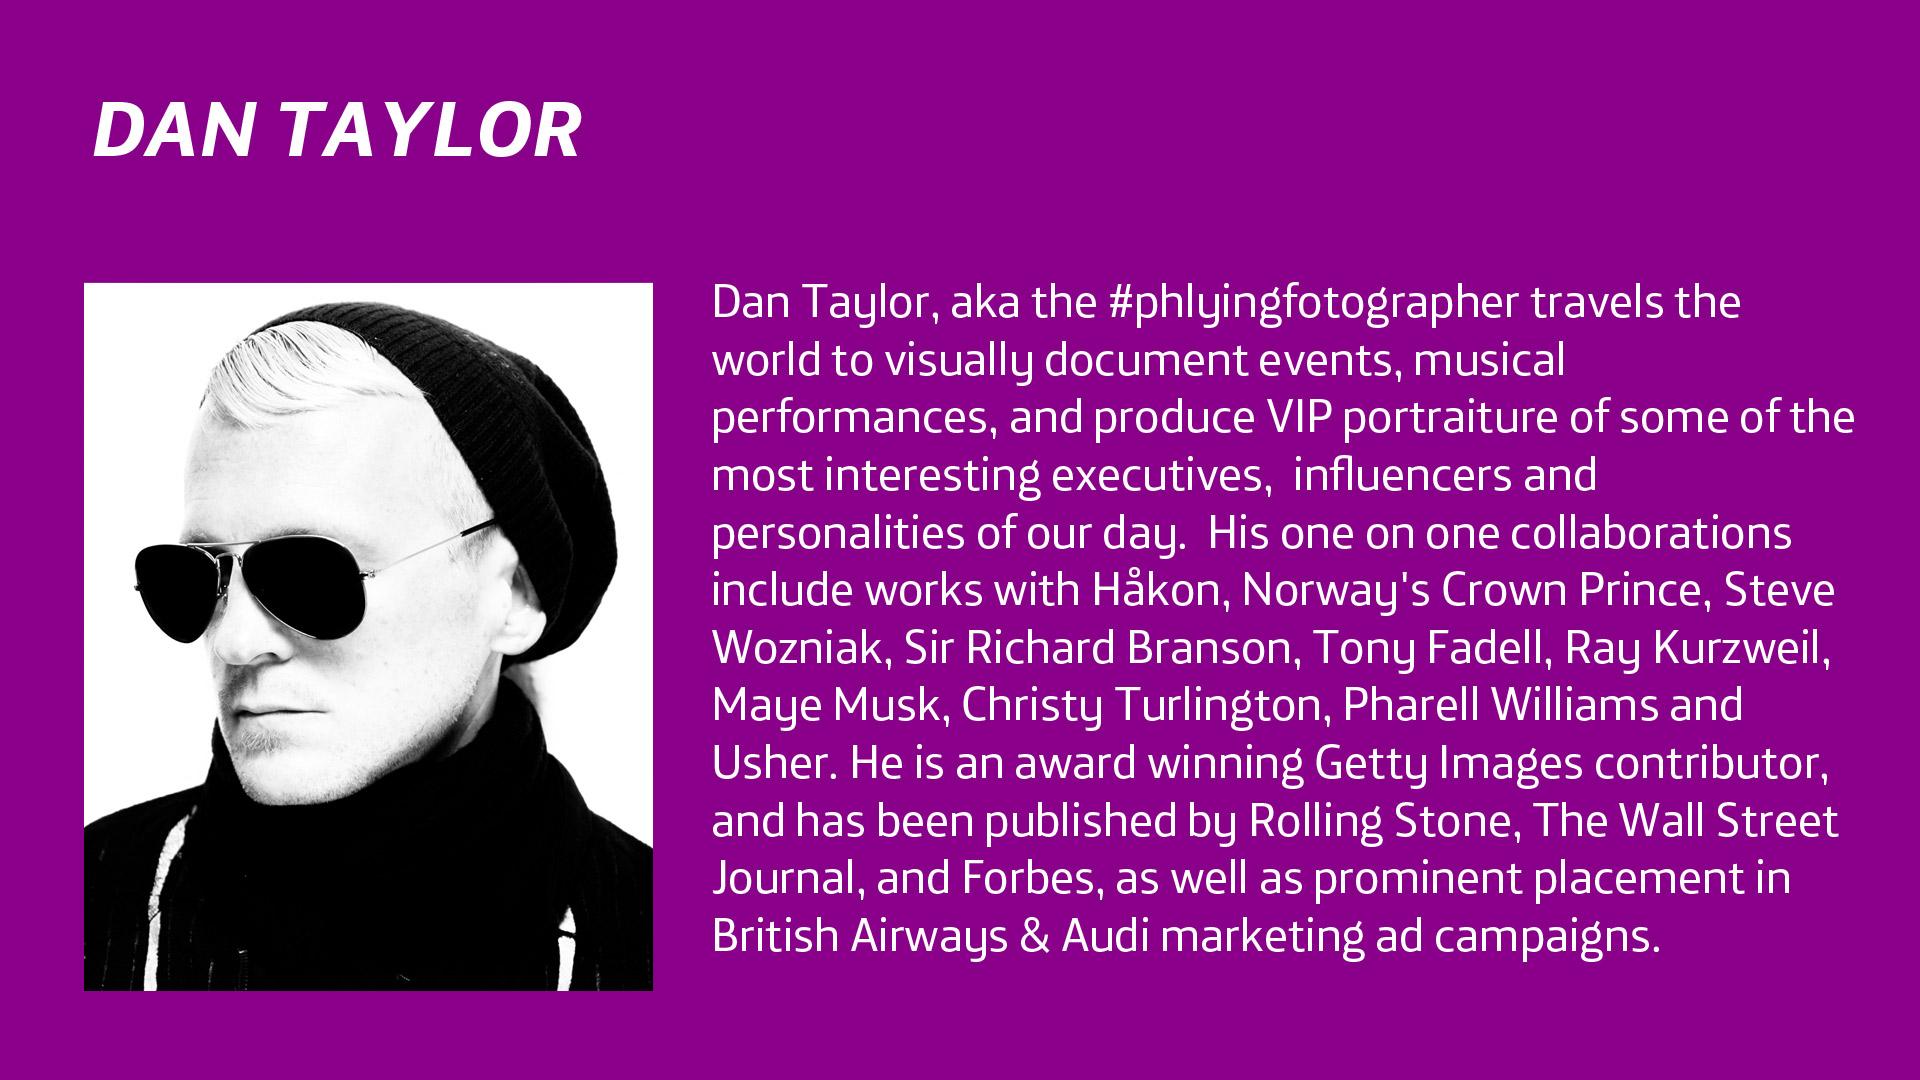 Dan-Taylor-1920x1080